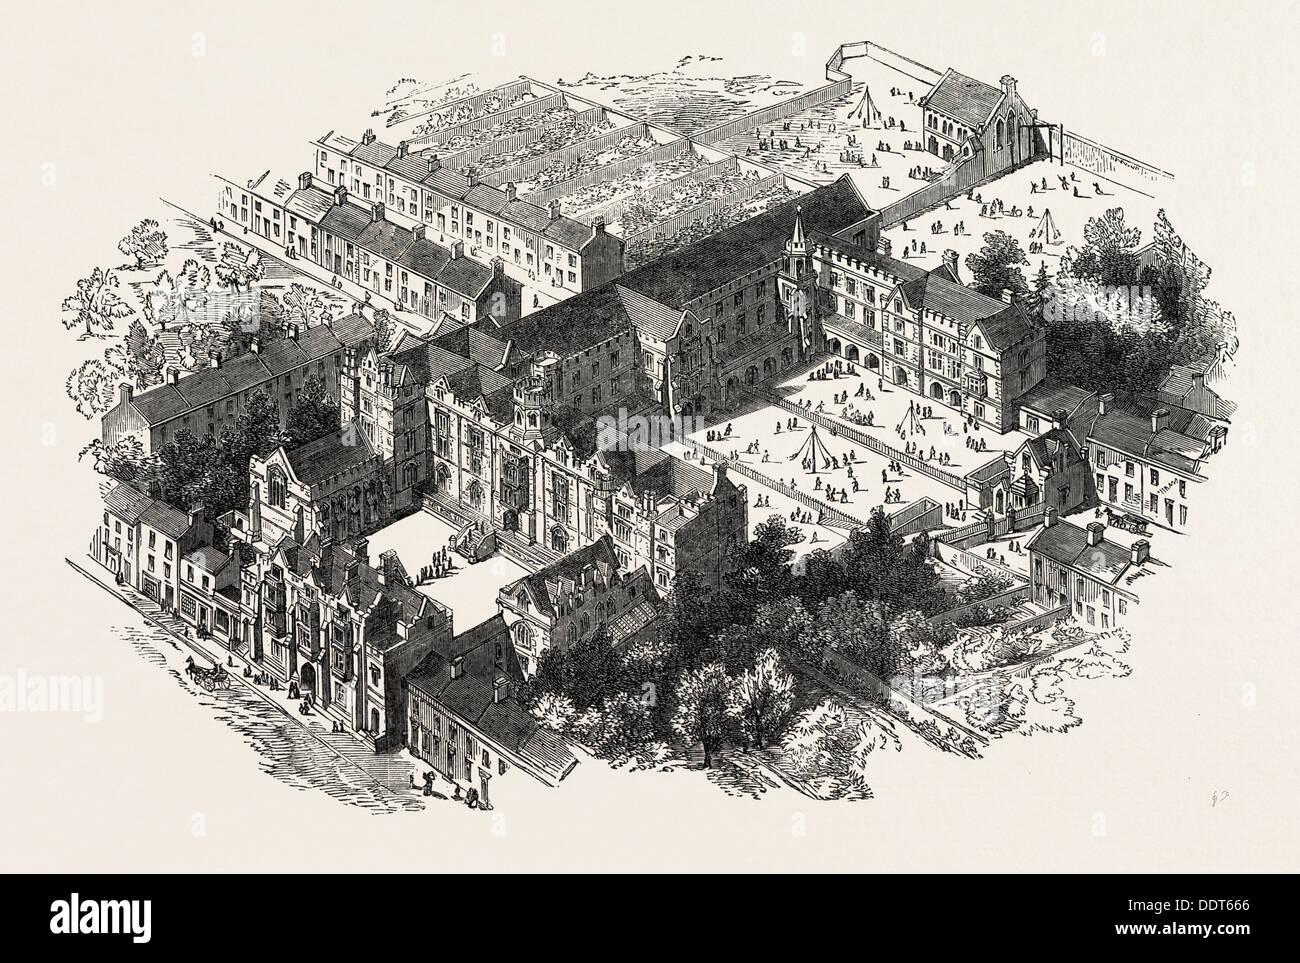 THE WESLEYAN NORMAL COLLEGE, WESTMINSTER, LONDON, UK, 1851 engraving - Stock Image